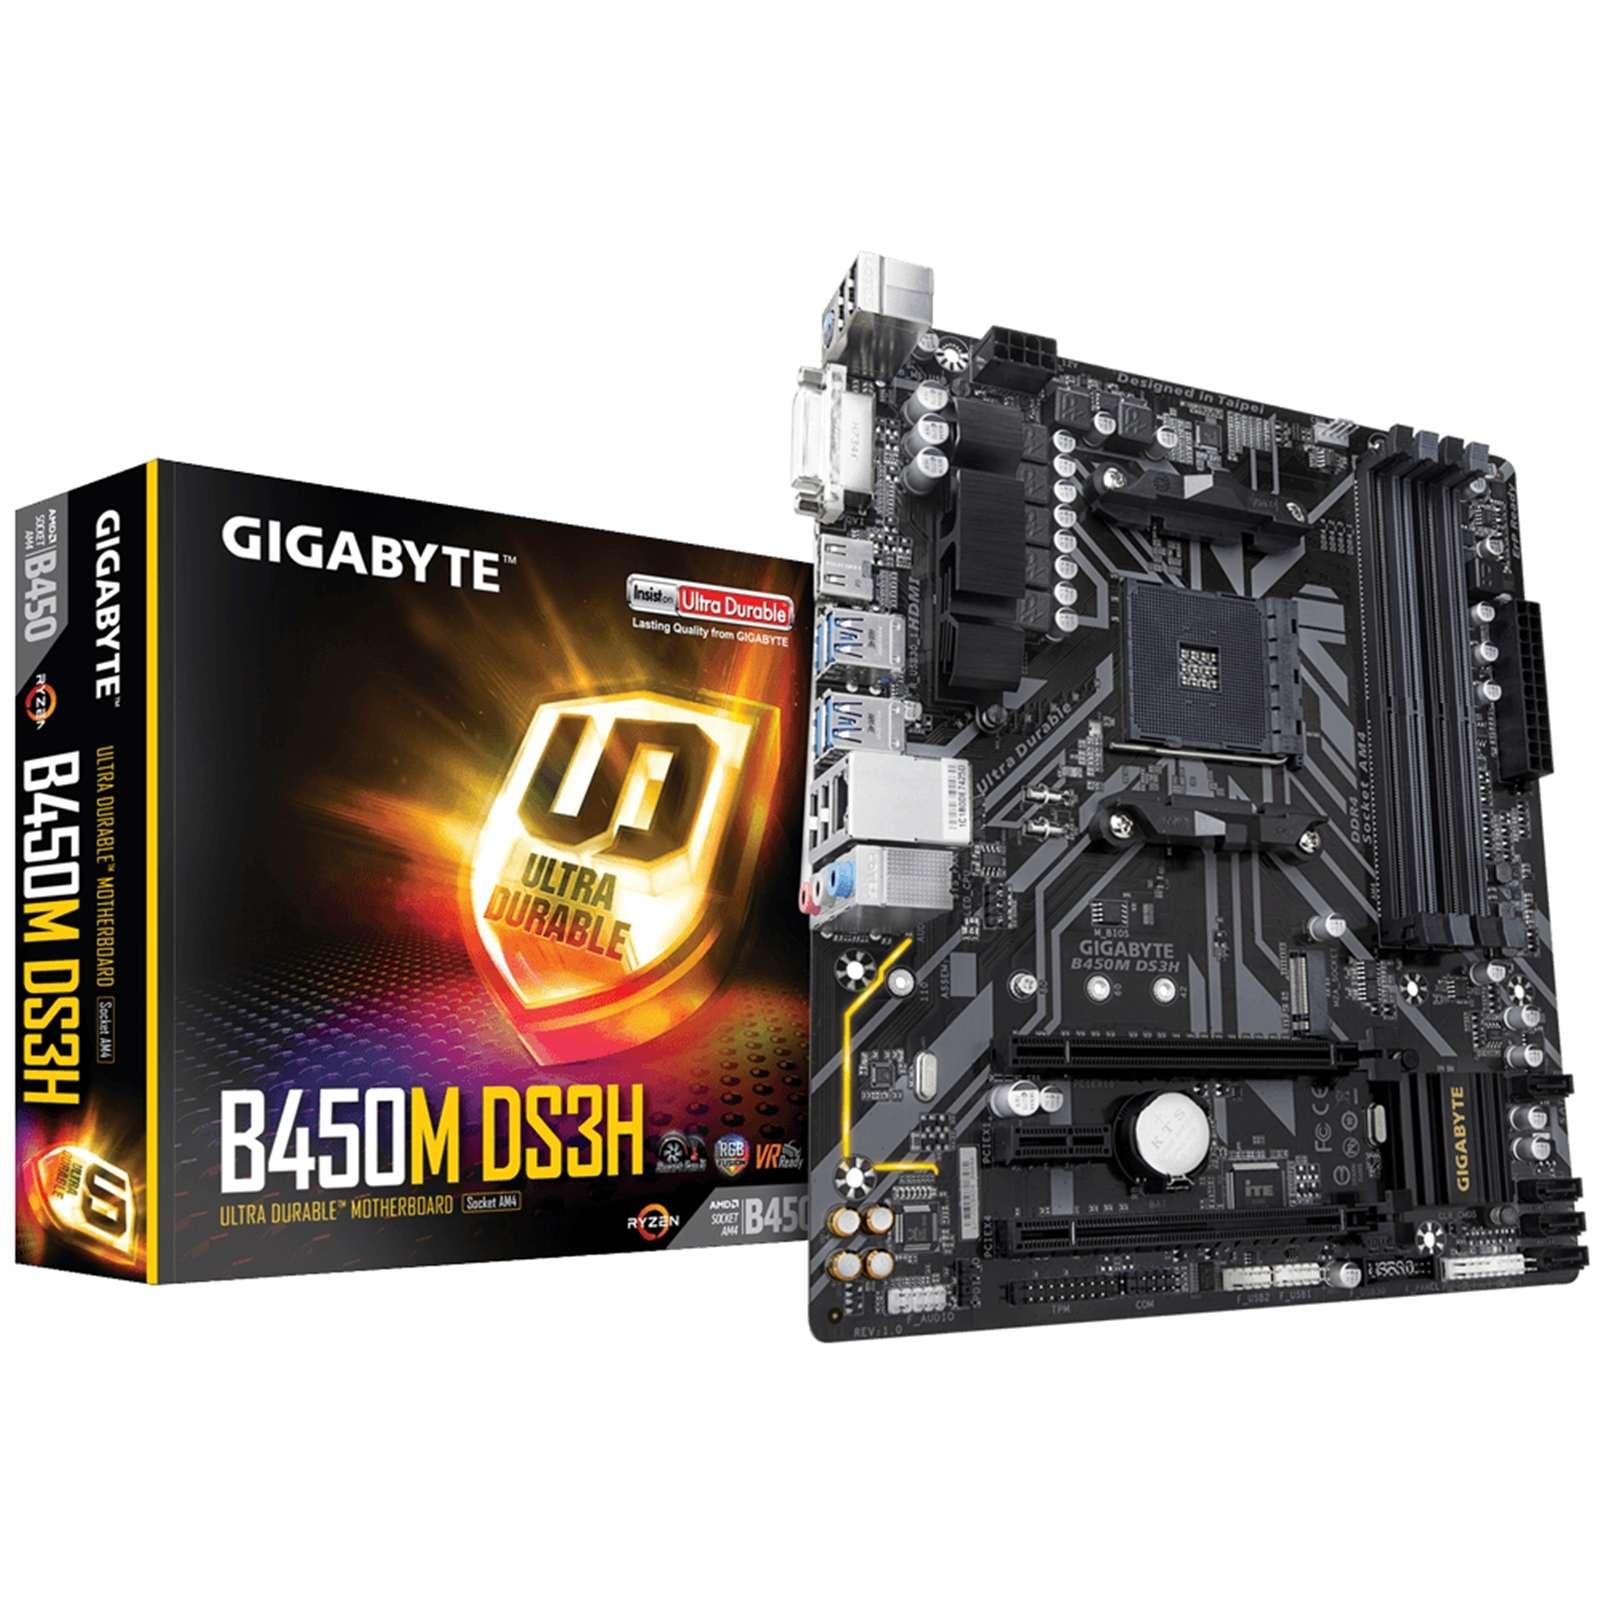 Gigabyte B450M DS3H AMD Socket AM4 Micro ATX DVI-D/HDMI DDR4 USB 3.1 Motherboard